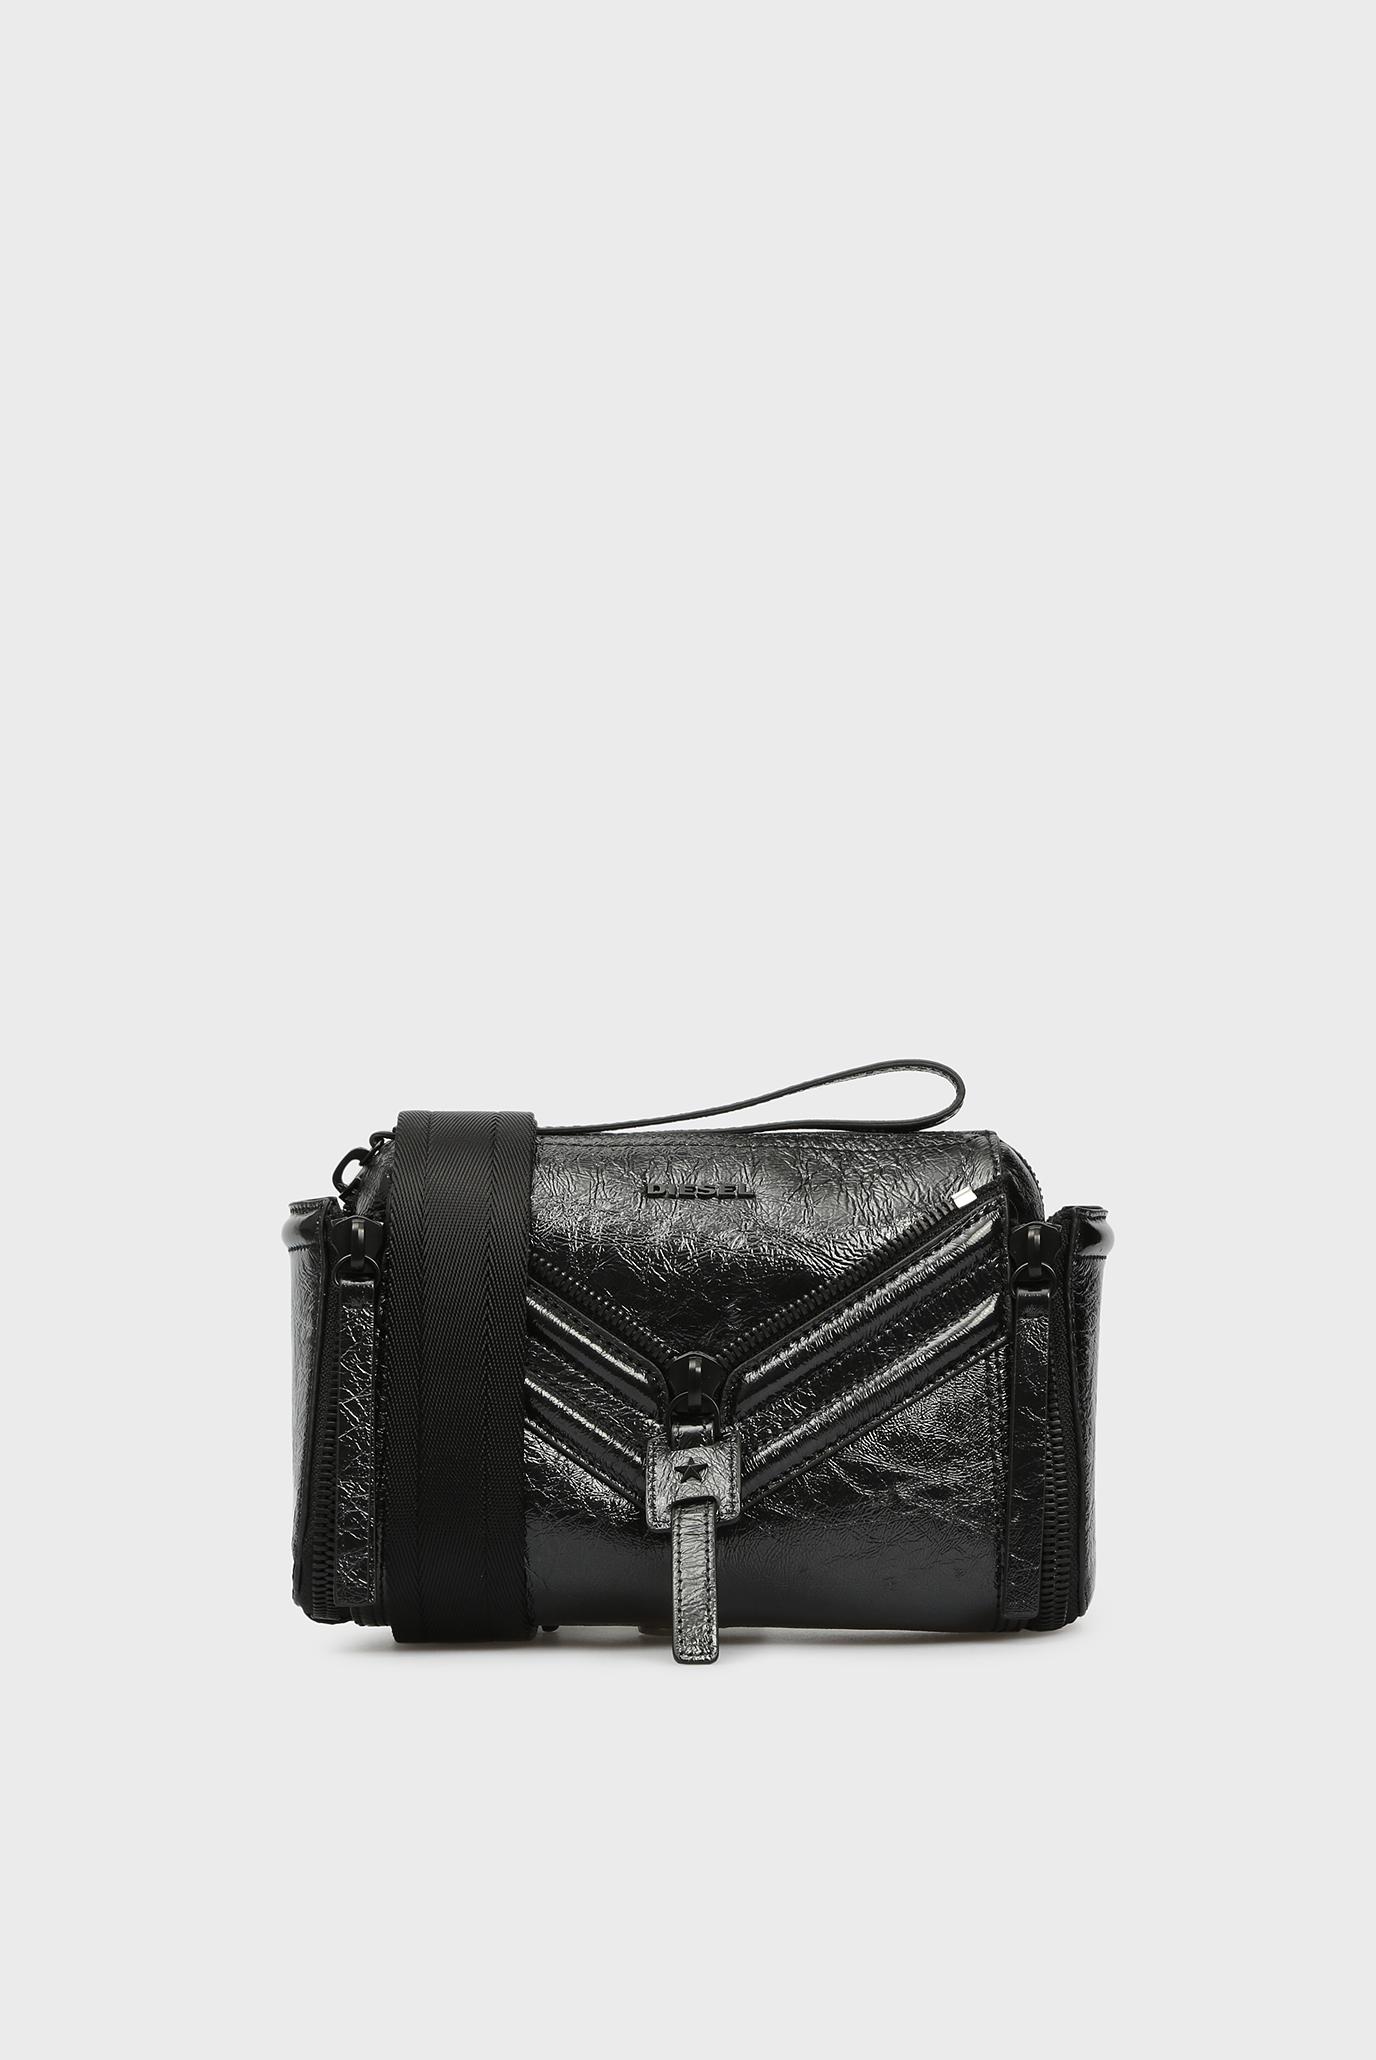 732821e385b2 Купить Женская черная сумка через плечо LE-ZIPPER Diesel Diesel X05881  PR013 – Киев, Украина. Цены в ...